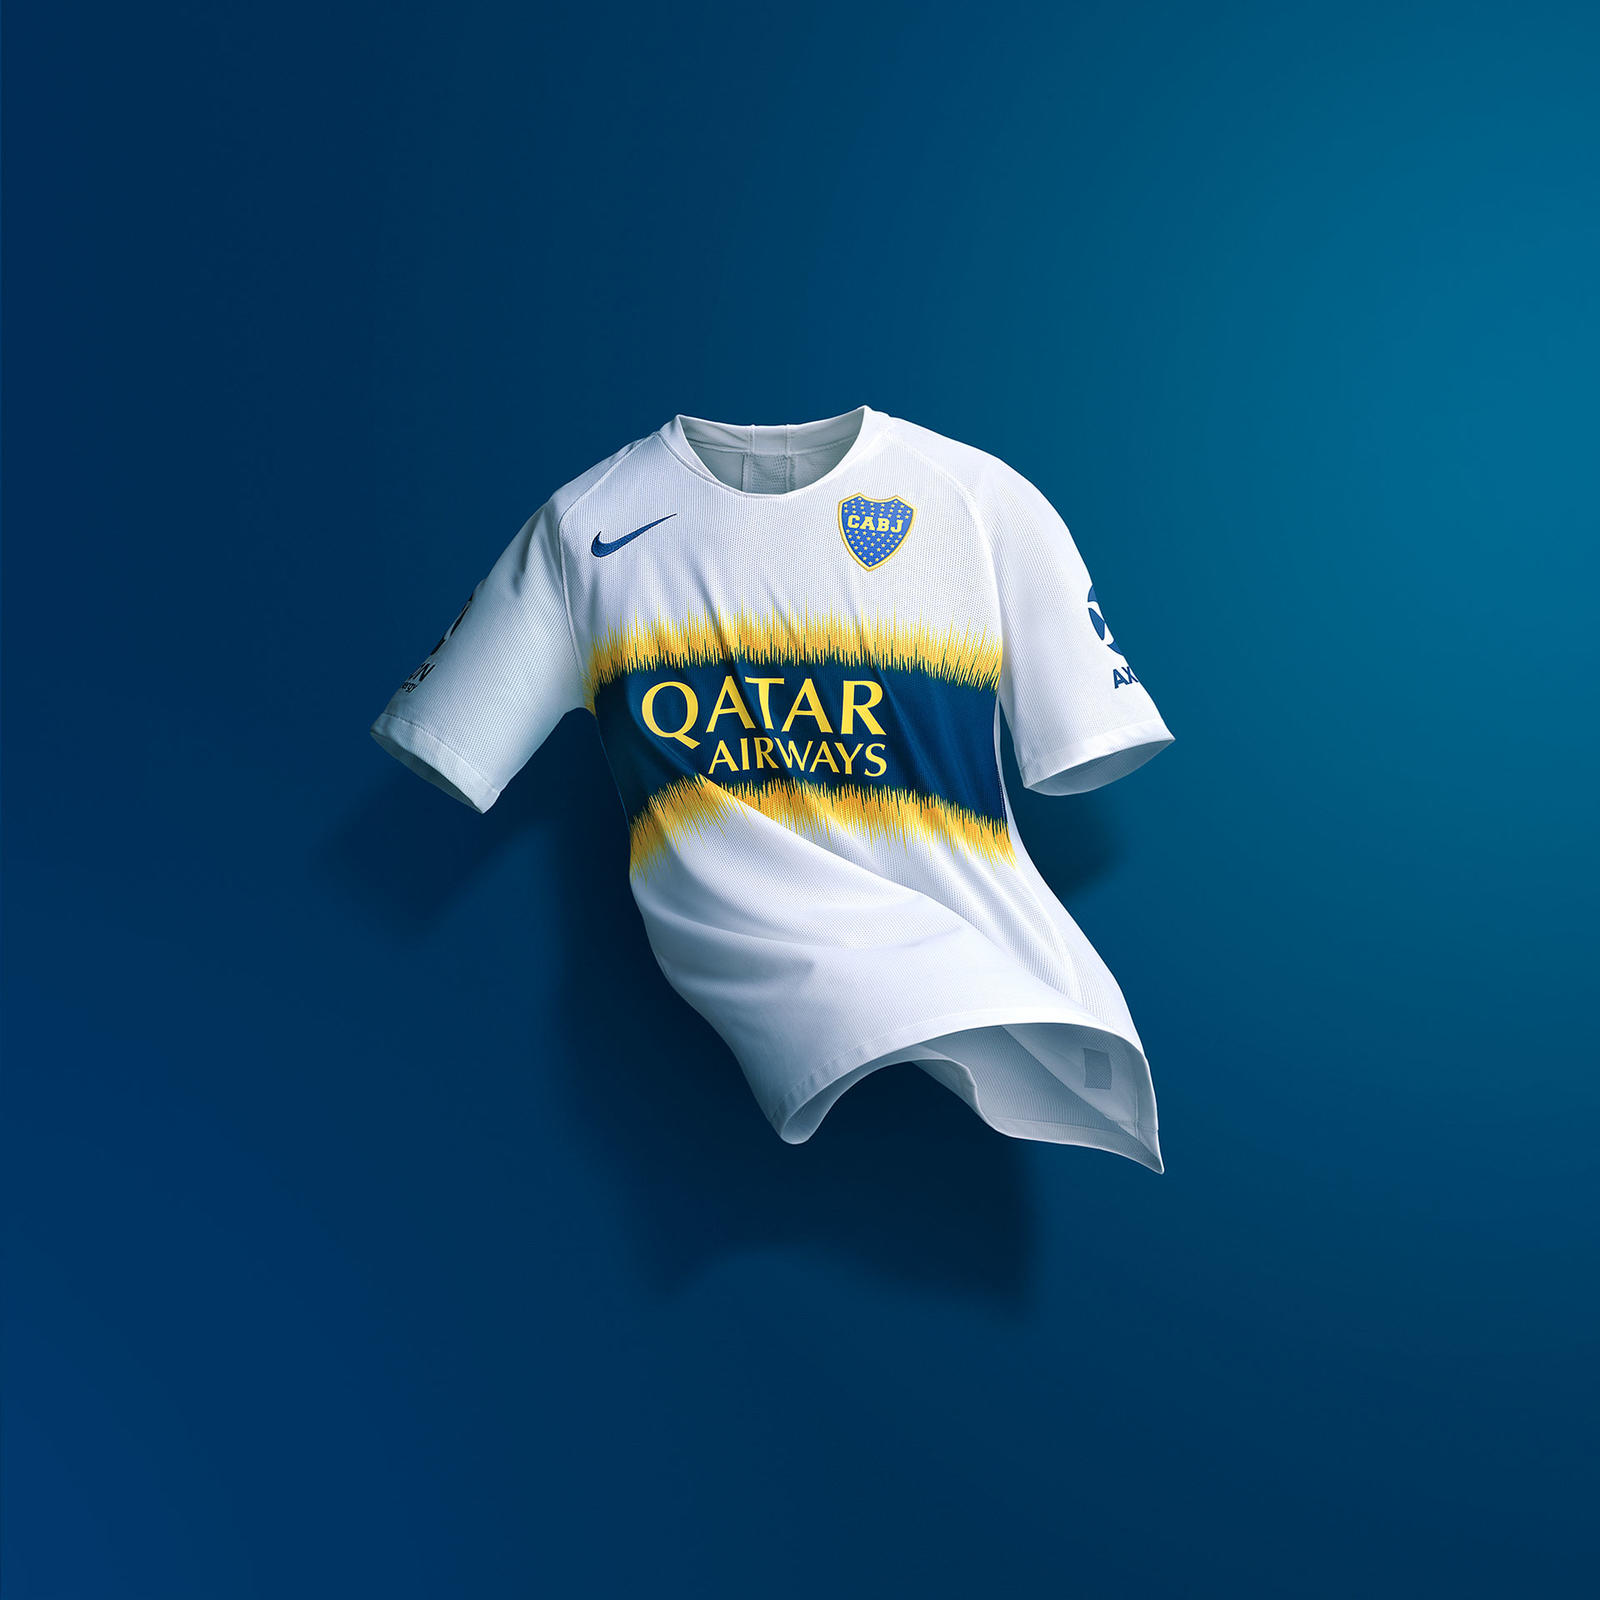 Club Atletico Boca Juniors Kit Collection Nike News - 2018